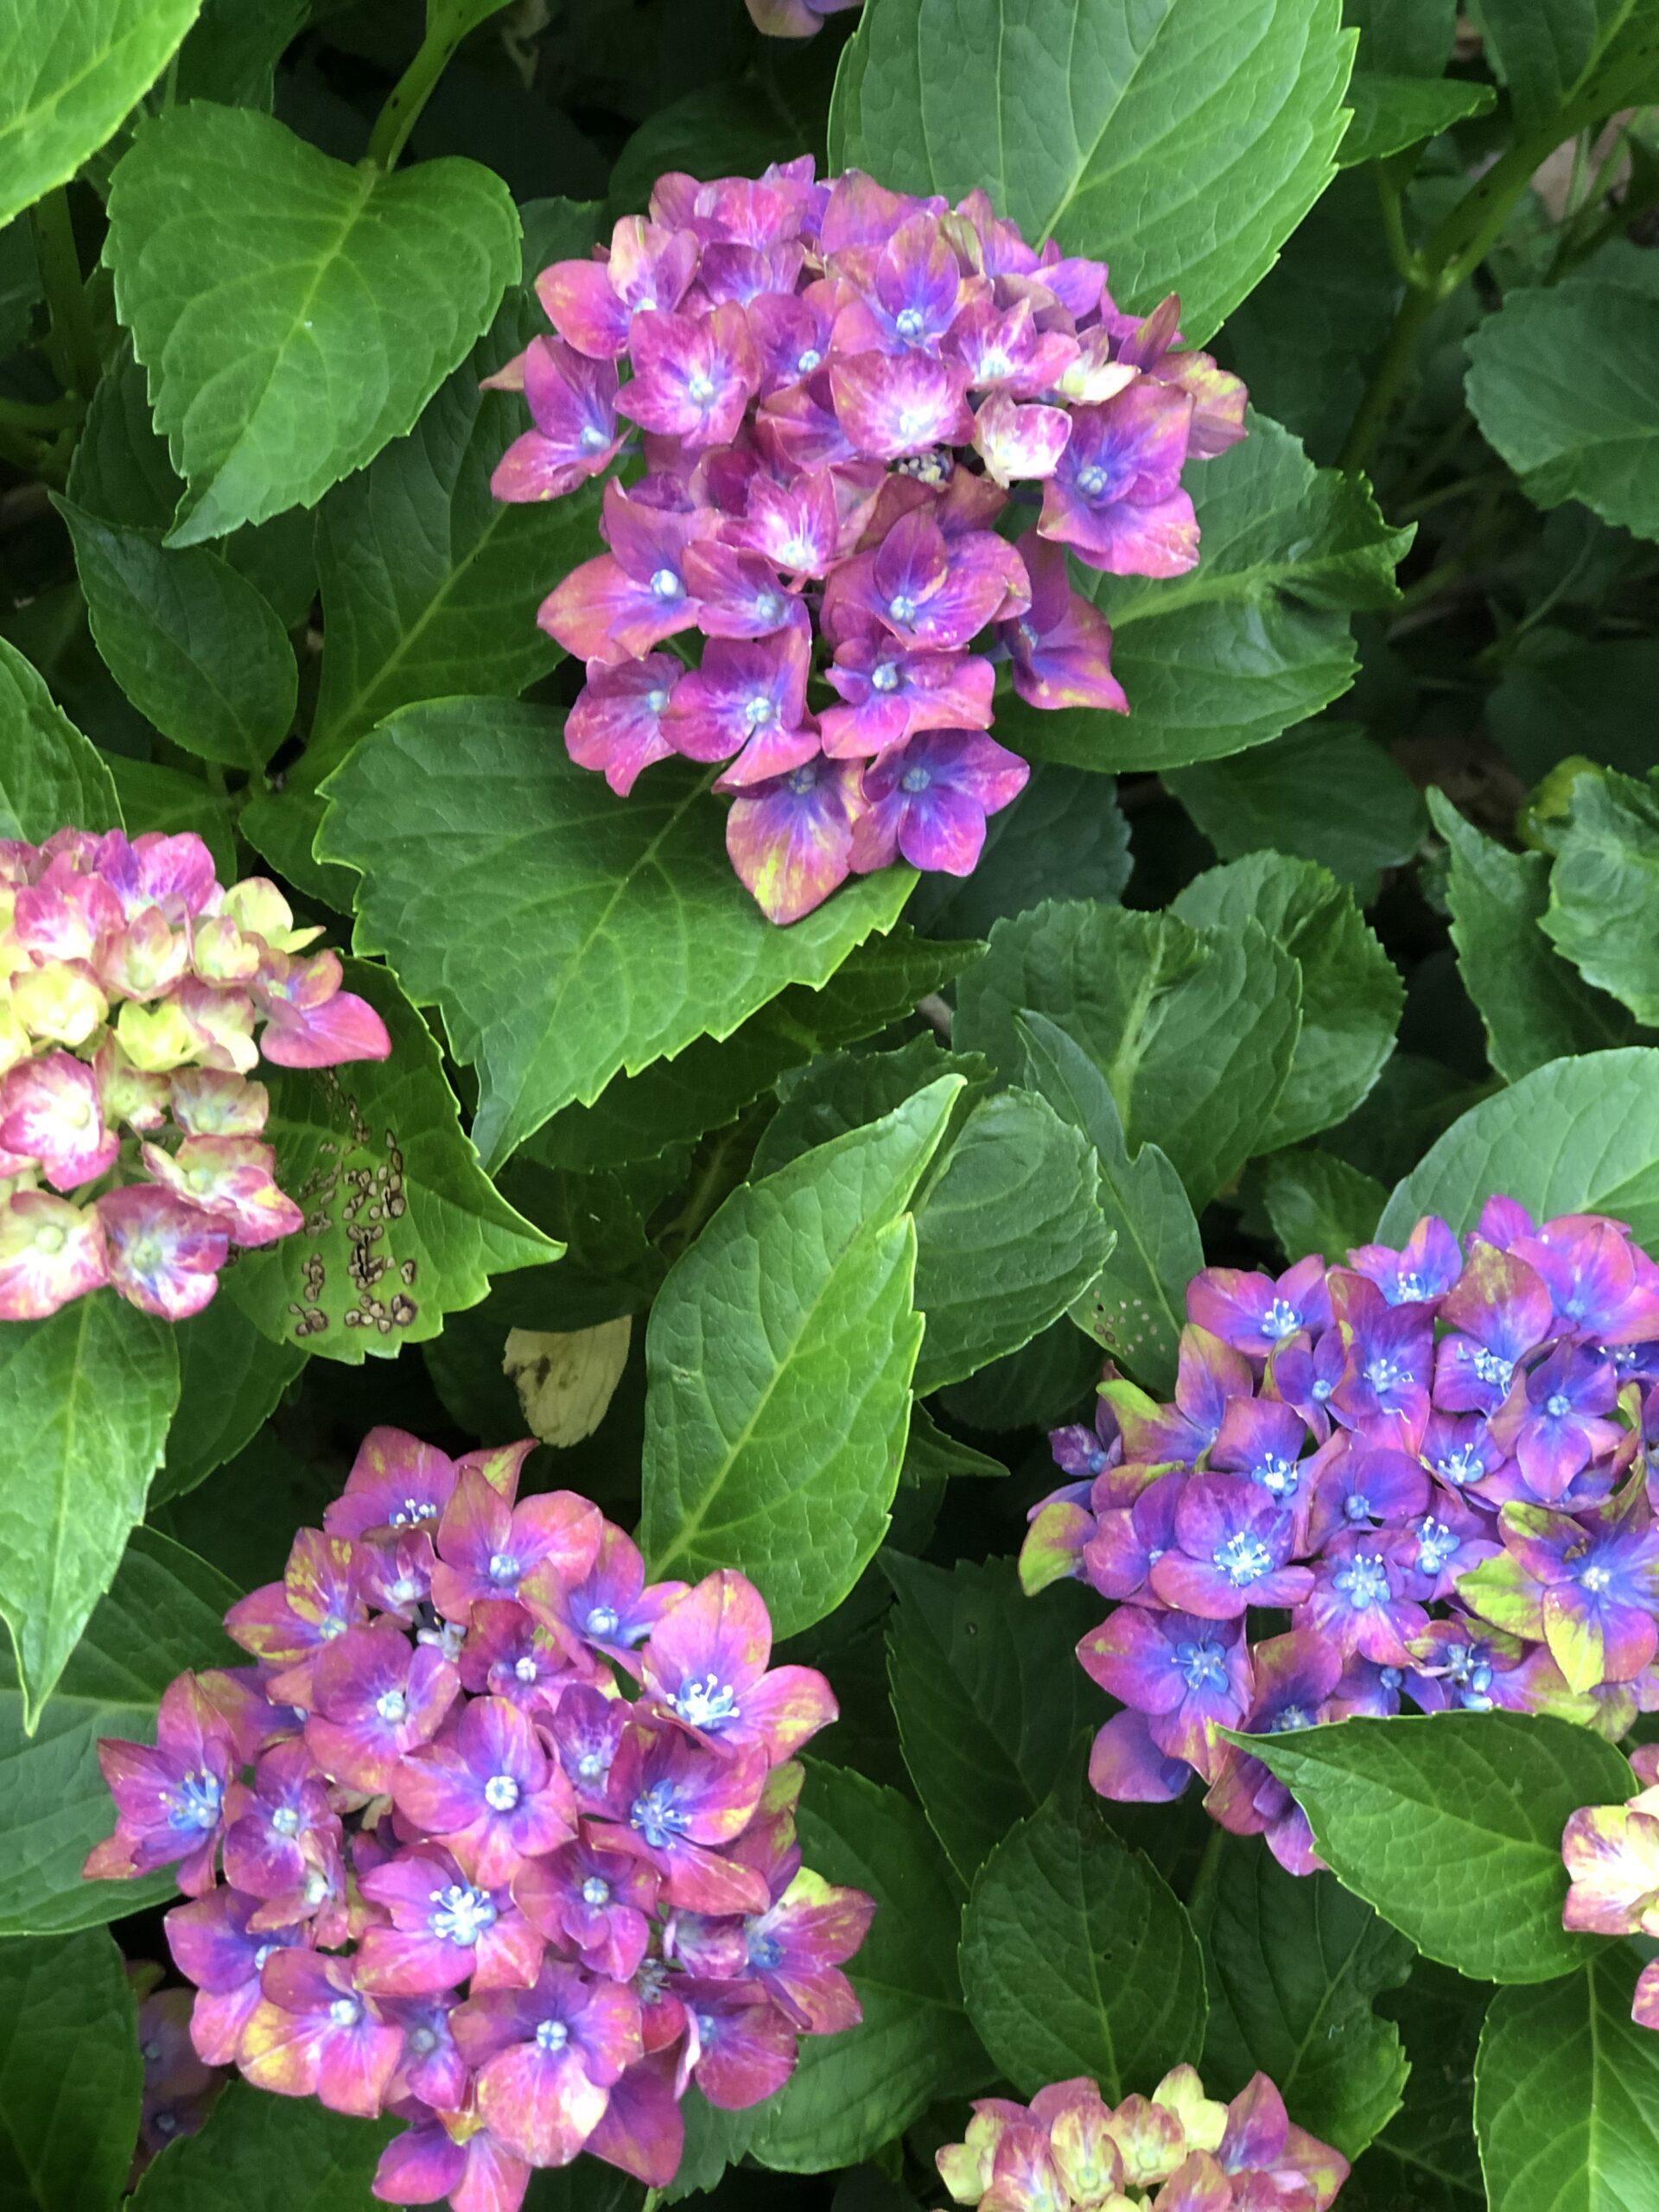 bigleaf hydrangea with multicolored blooms